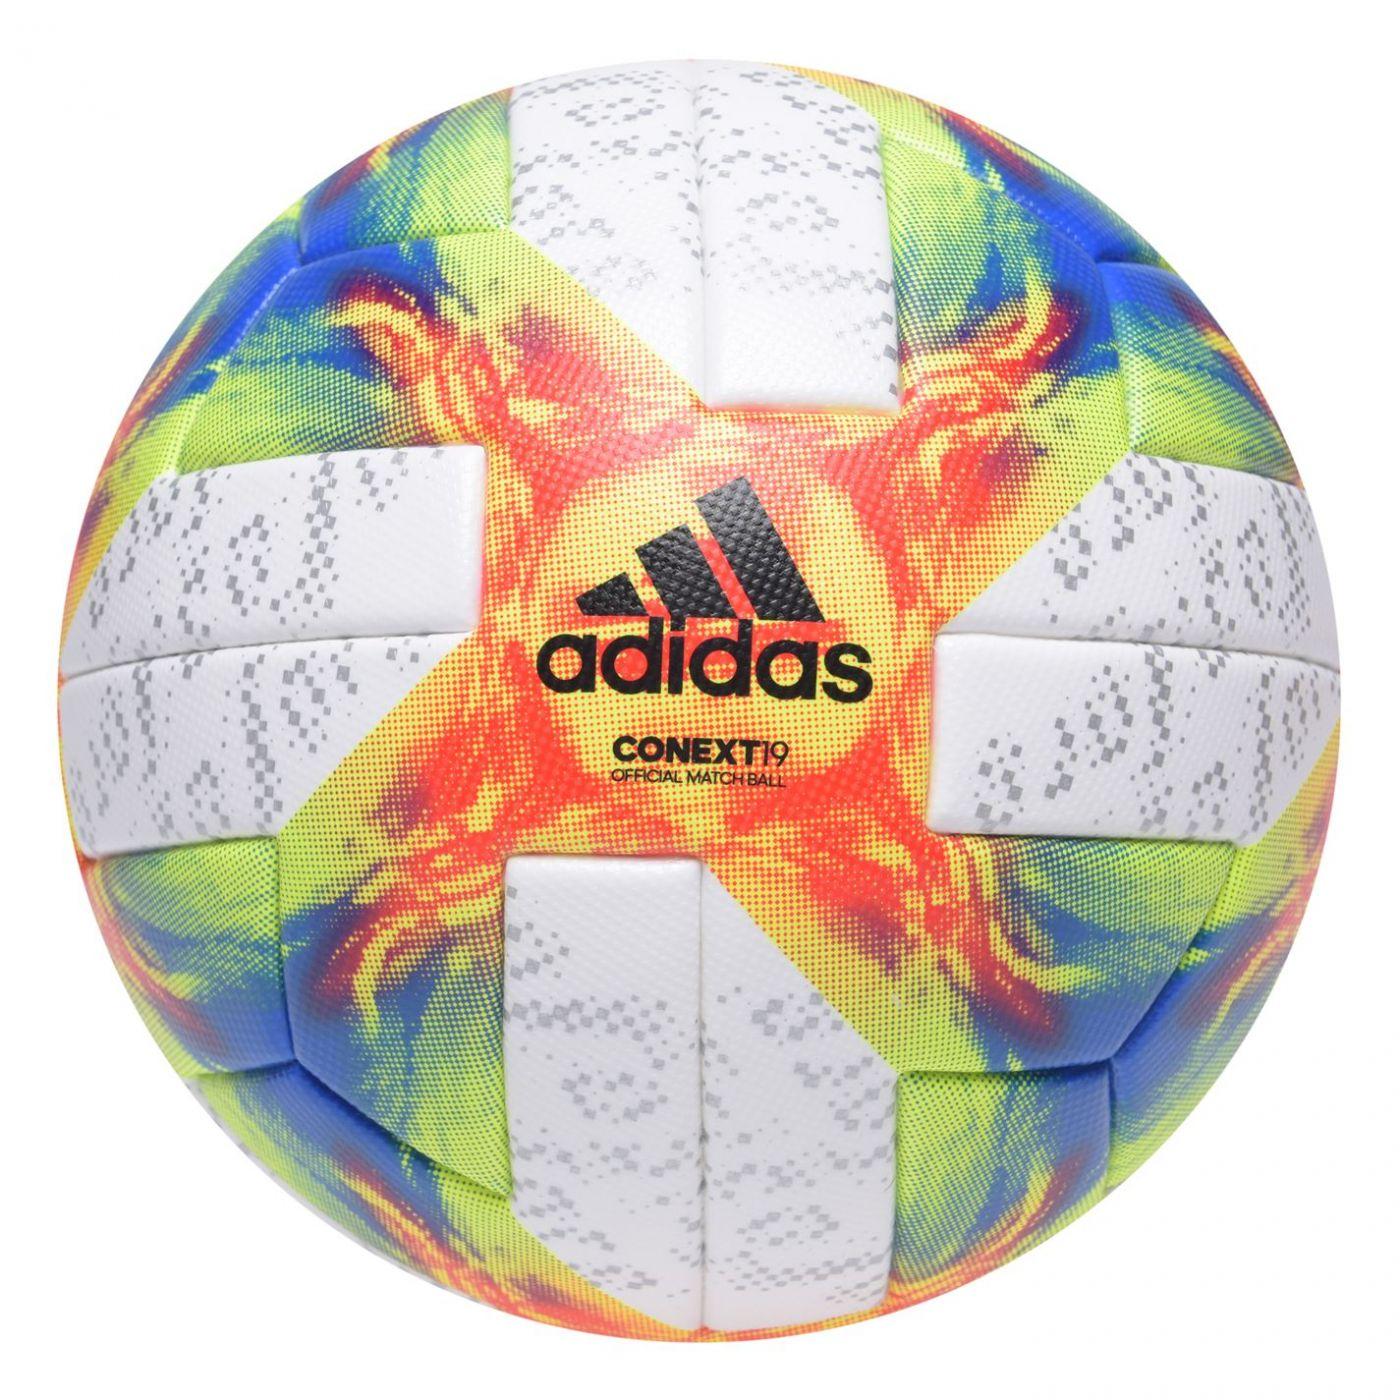 Adidas Conext 19 Women's World Cup Official Match Football